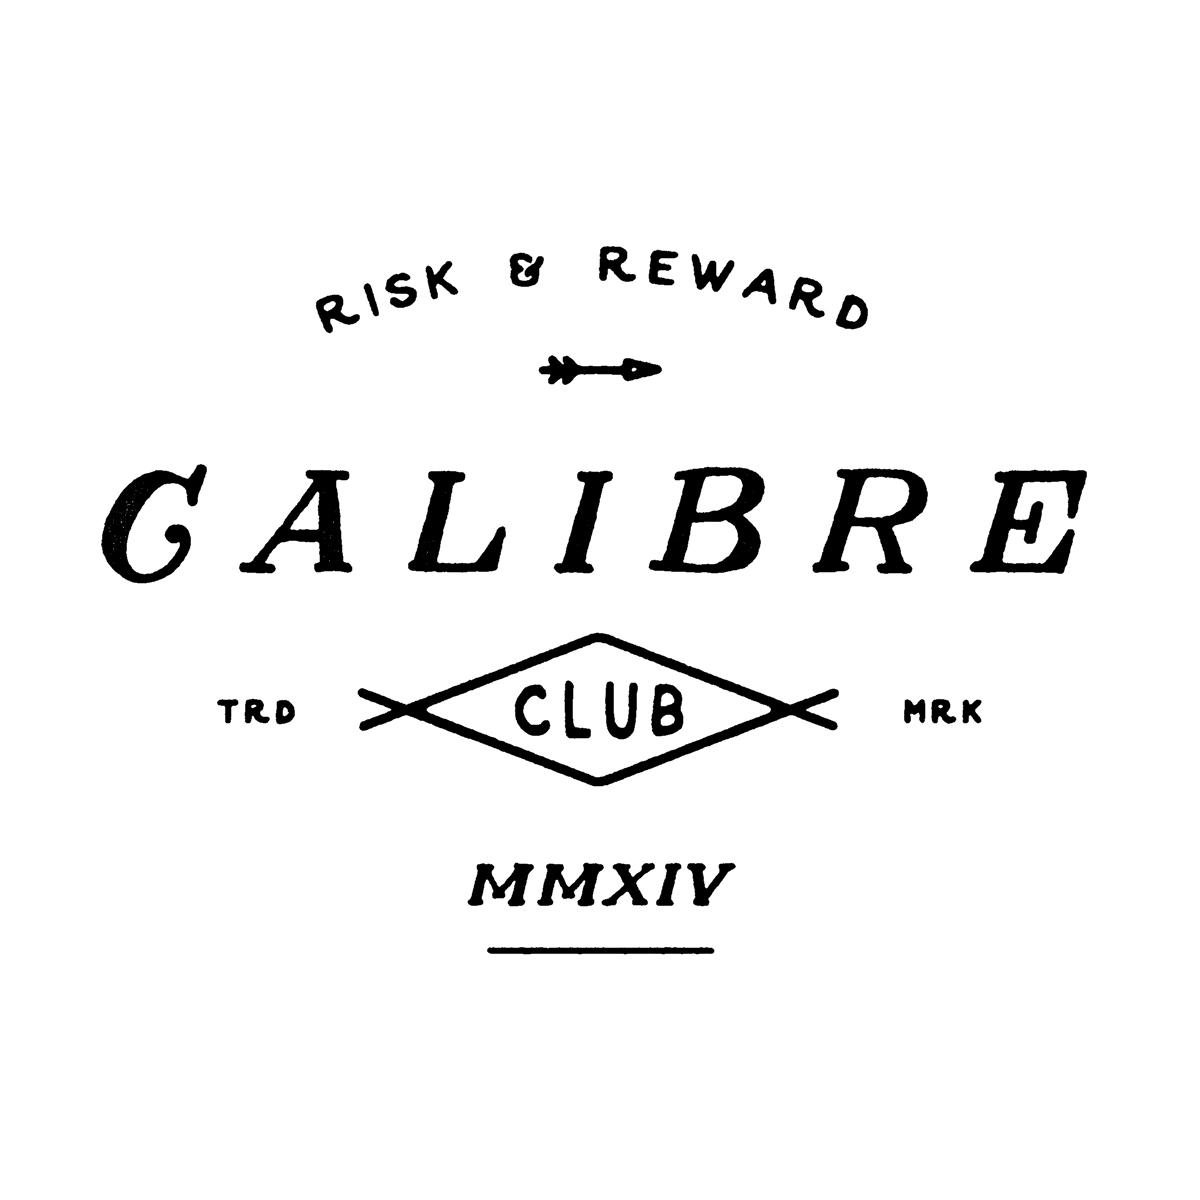 Calibre-Club-Drawn-Jeremy-Vessey.jpg